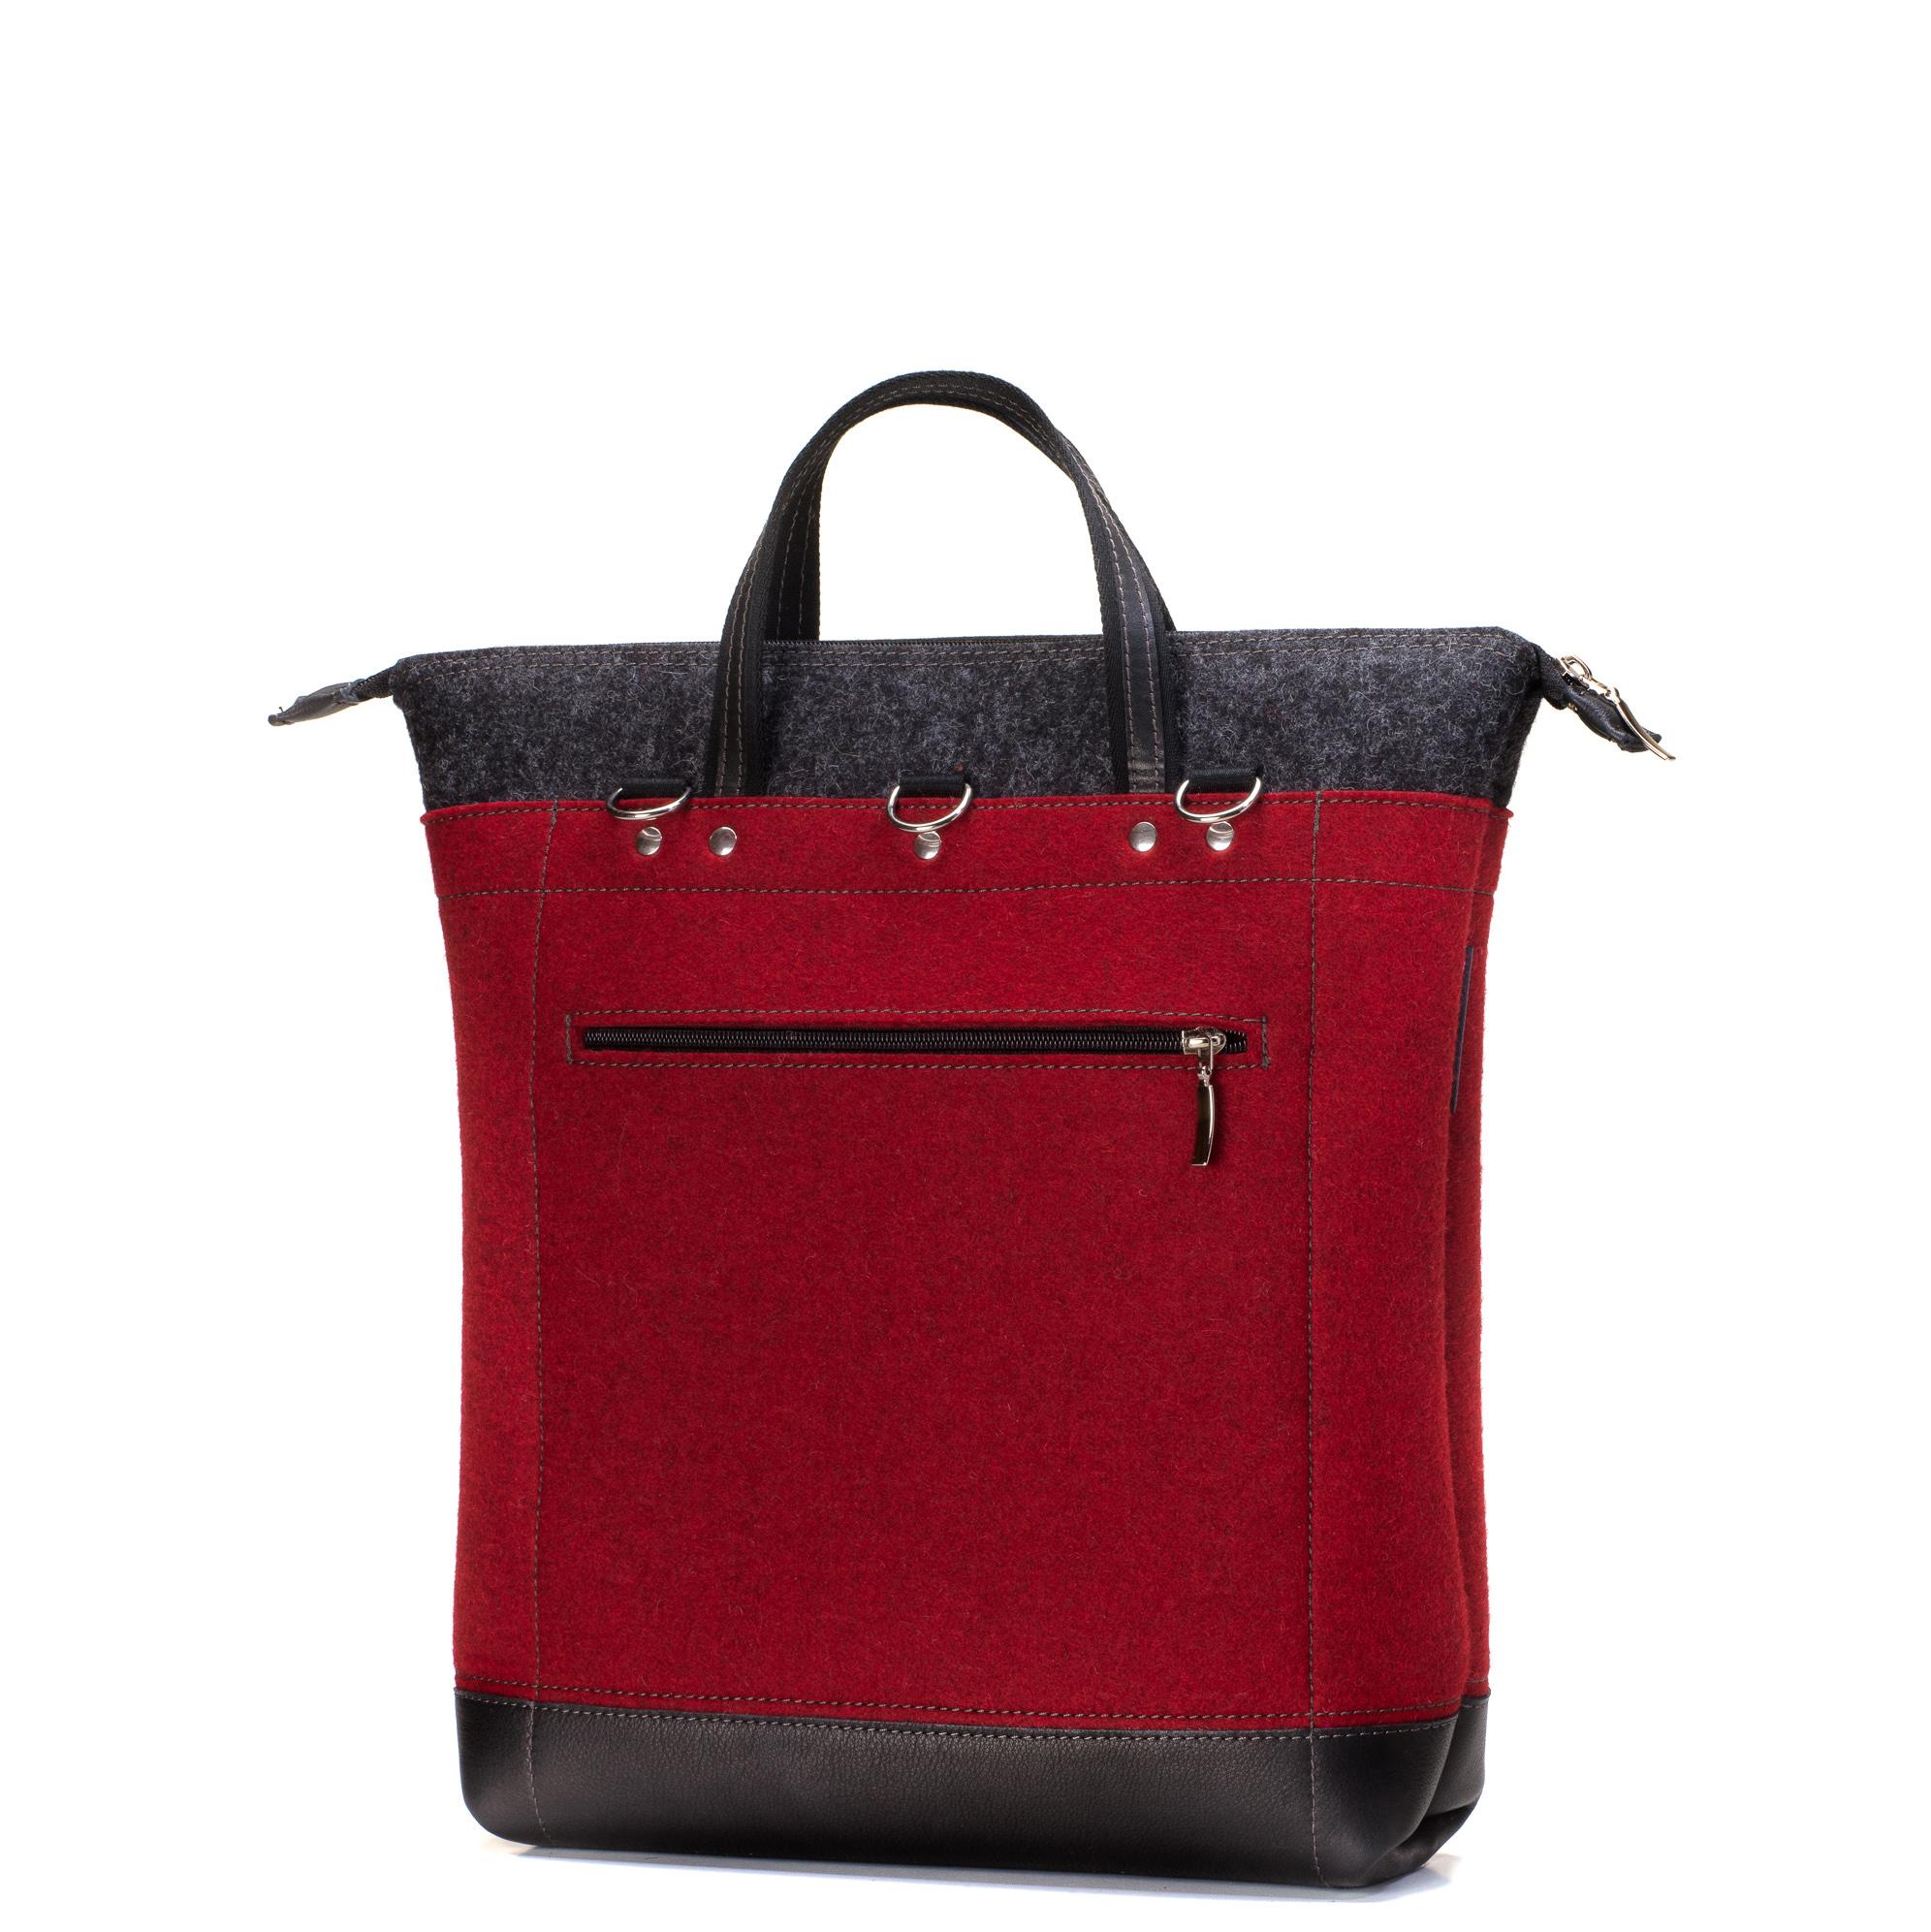 damen-handtasche-detail-filz-leder-paula-rot-designer-shop